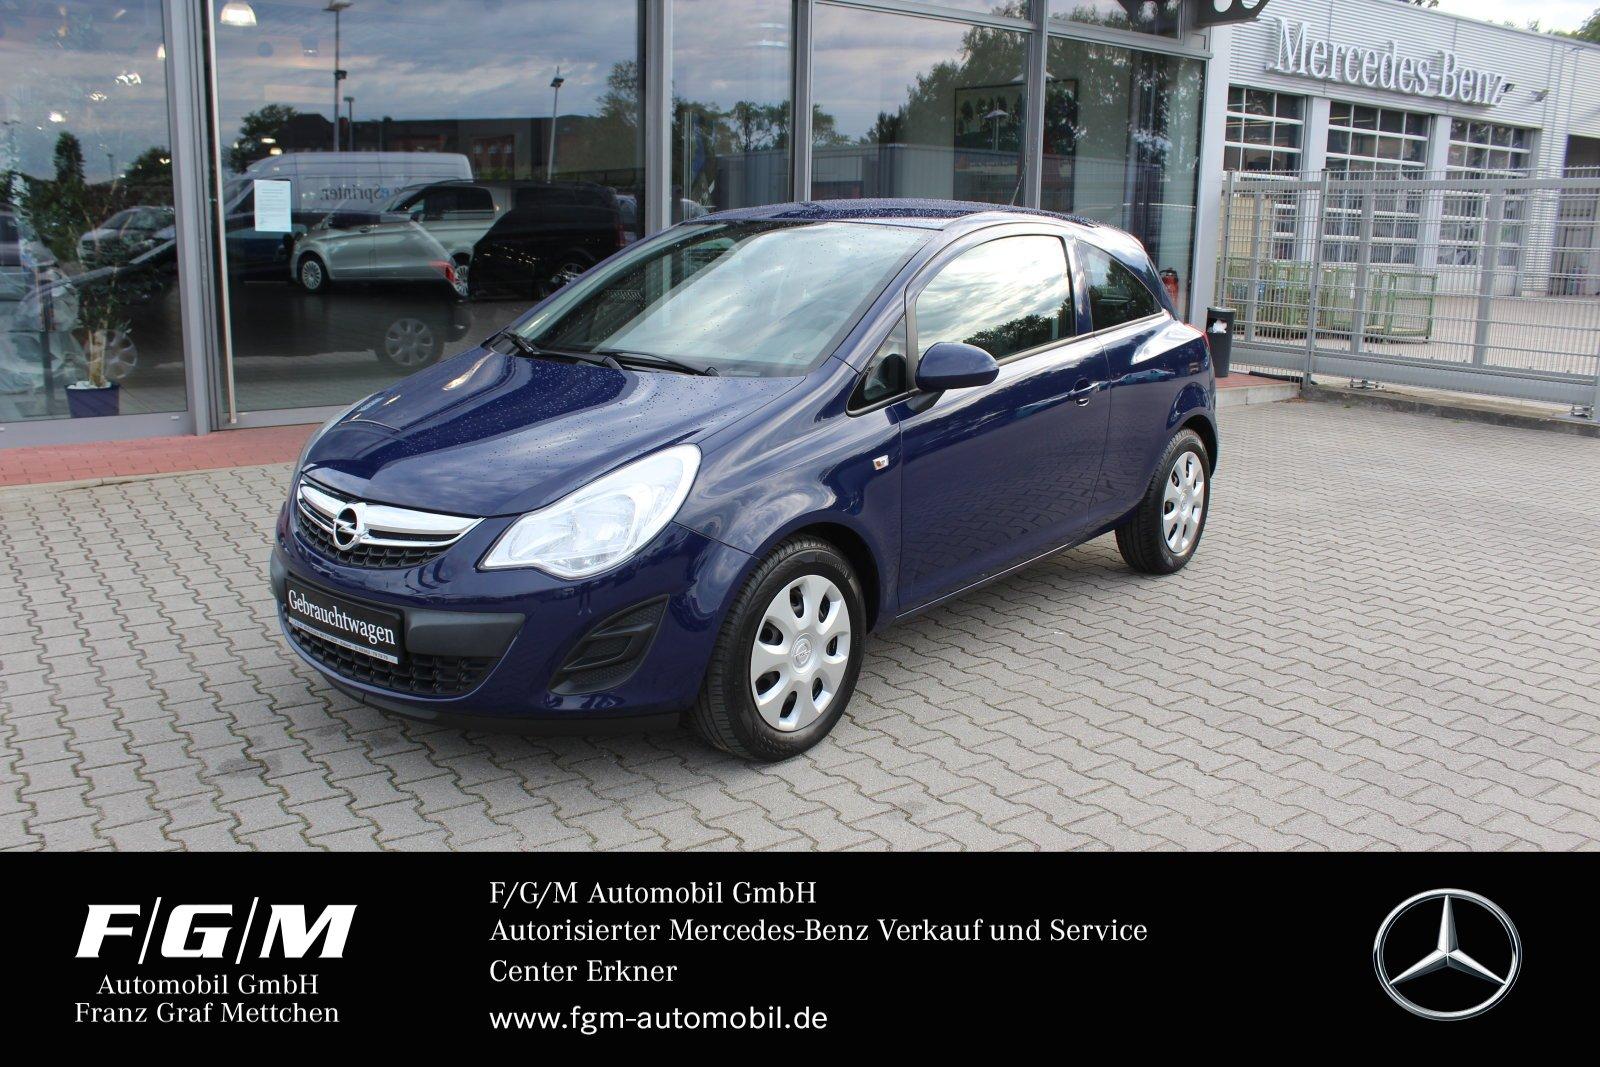 Opel Corsa D 1.2 Edition Klima/Chrompaket/R-CD, Jahr 2014, Benzin